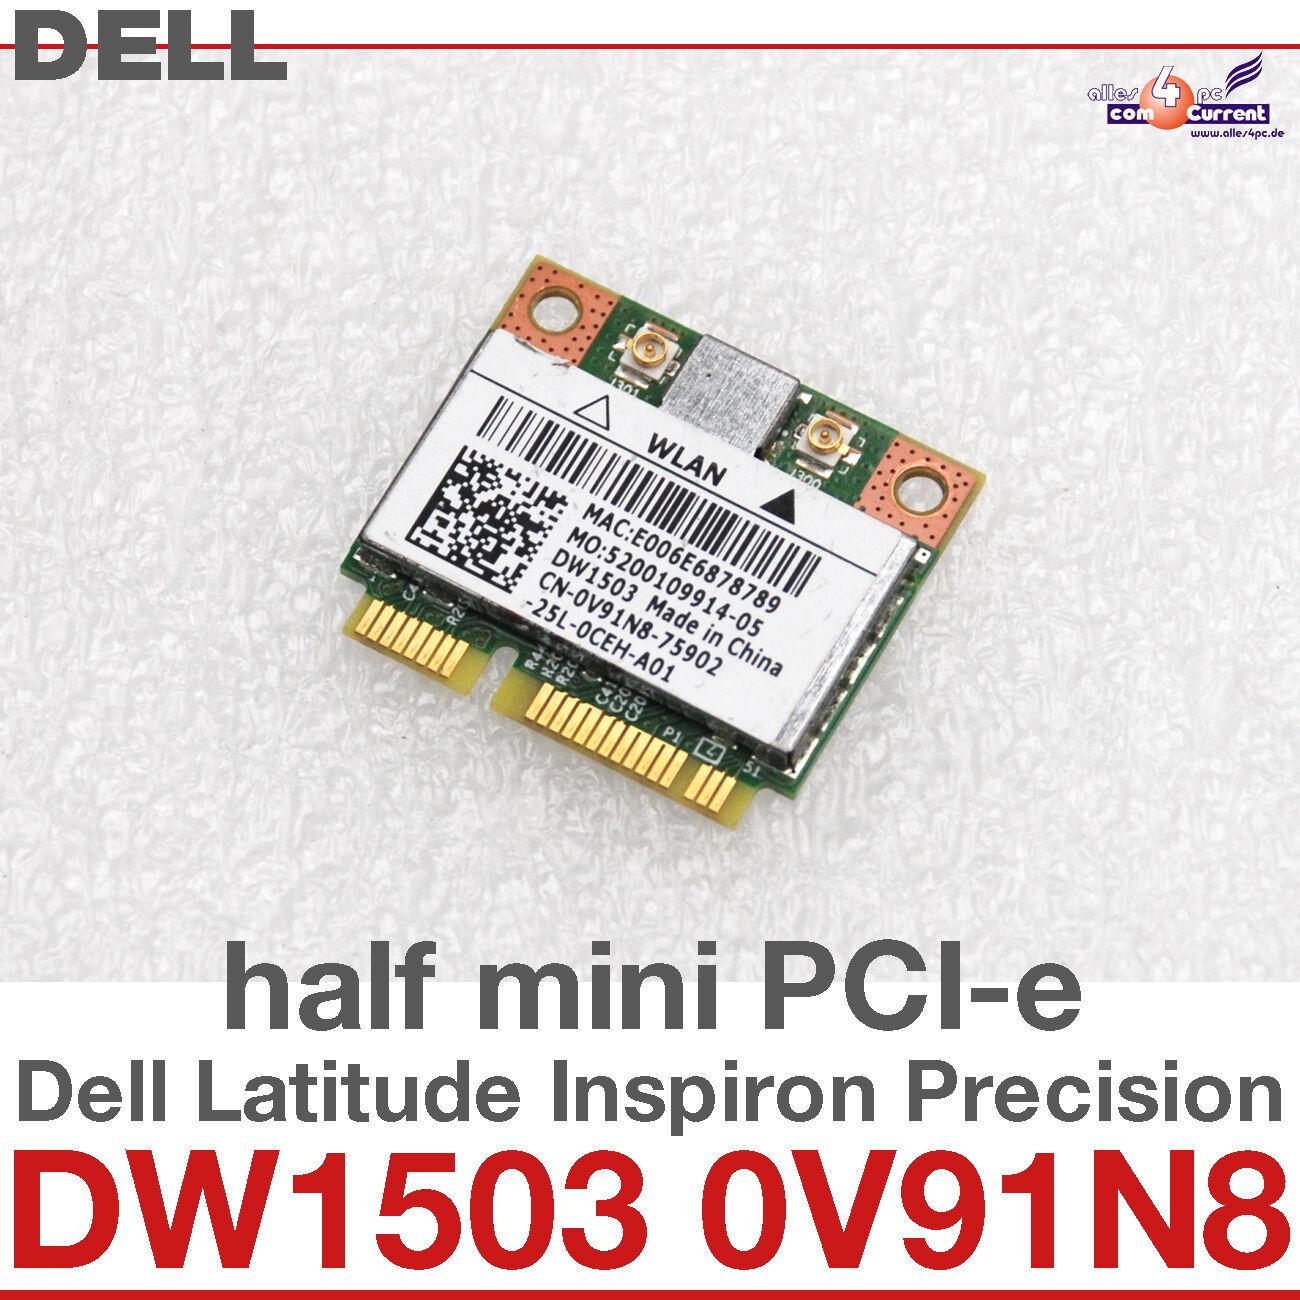 wi-Fi WLAN Wireless Card Network Card Dell Mini Pci-E DW1503 0V91N8 #D31